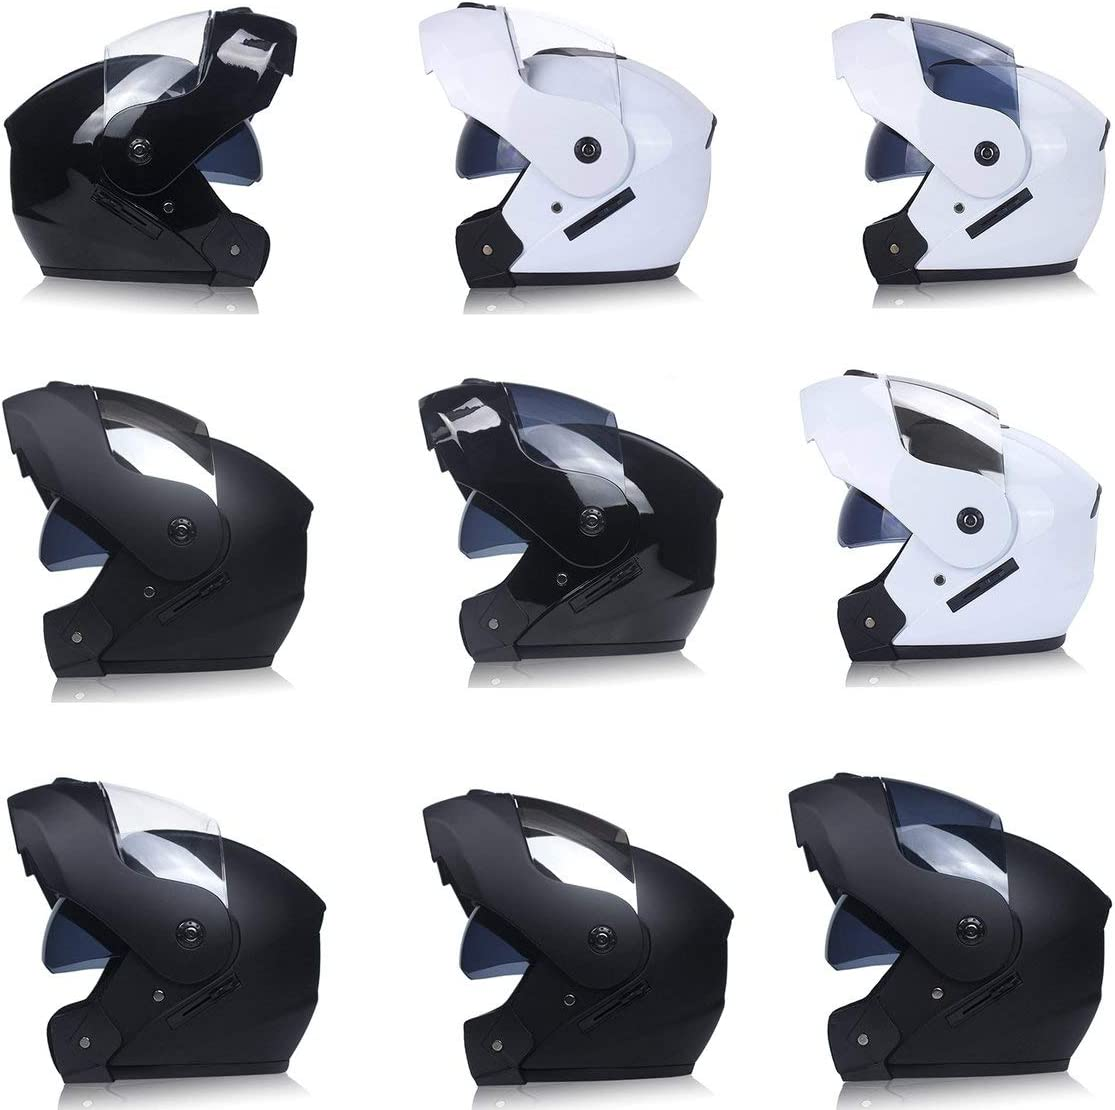 Farbe: Schwarz /& Silber Garciadia Motorradhelm Double Lens Jethelm Integralhelm Rennhelm Laufhelm Unisex Dual-Use-Helm Szie: L